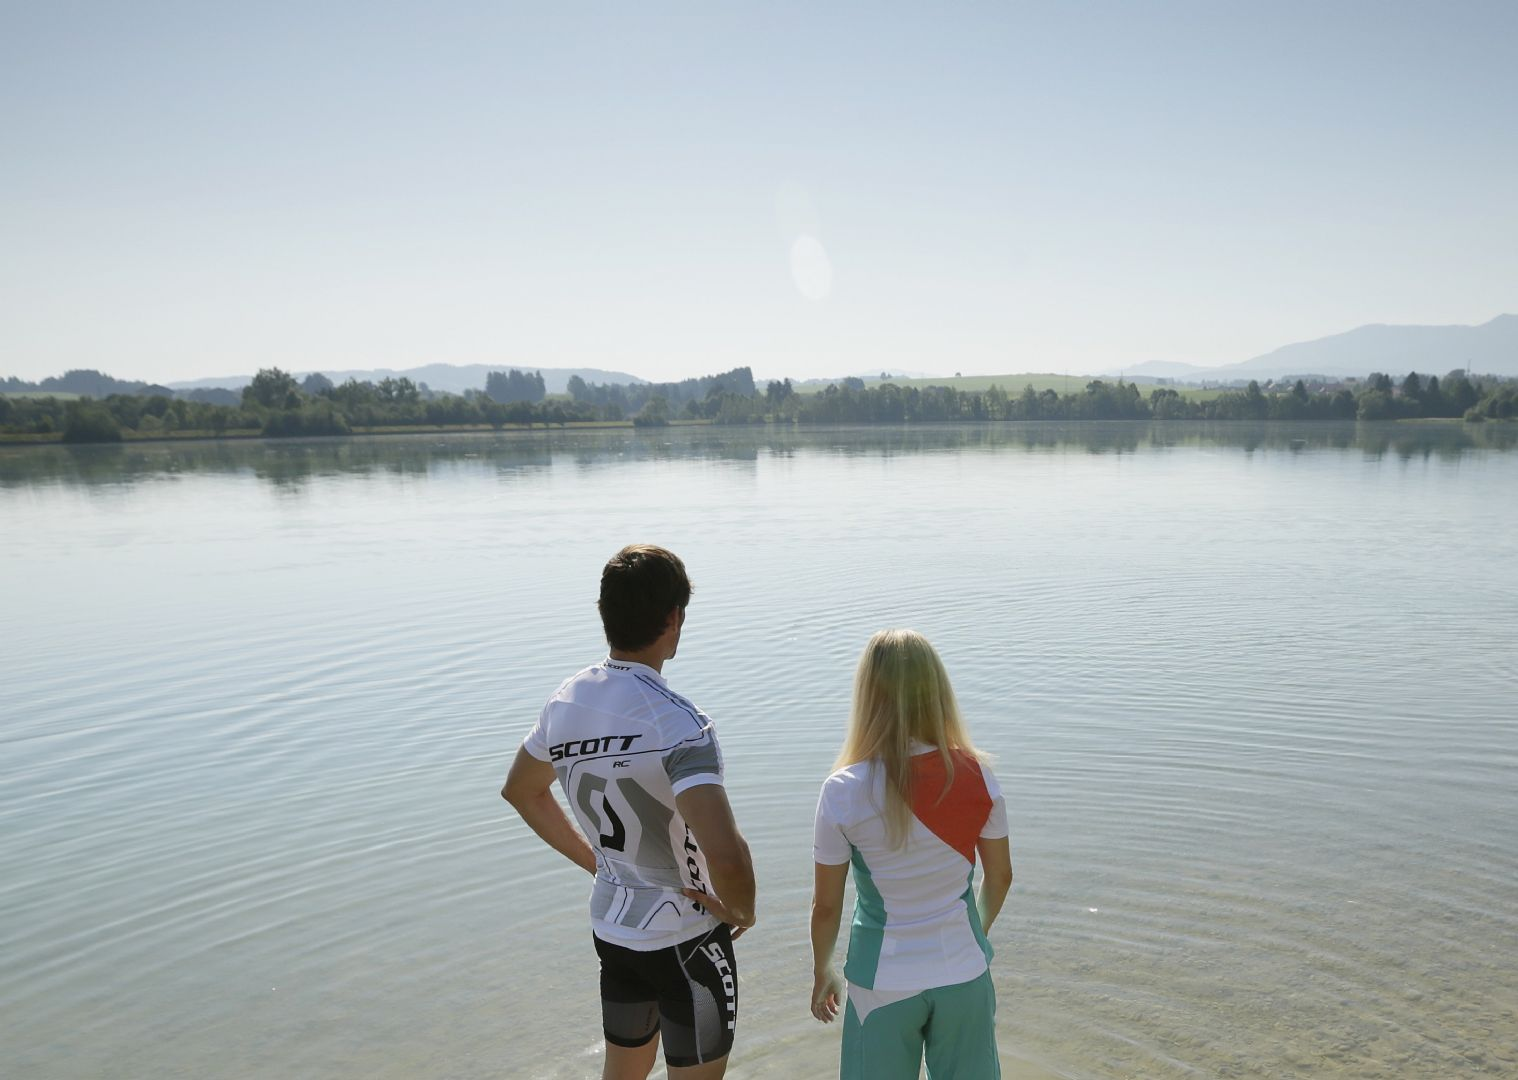 leisurecyclingbavaria.jpg - Germany - Bavarian Lakes - Self-Guided Leisure Cycling Holiday - Leisure Cycling